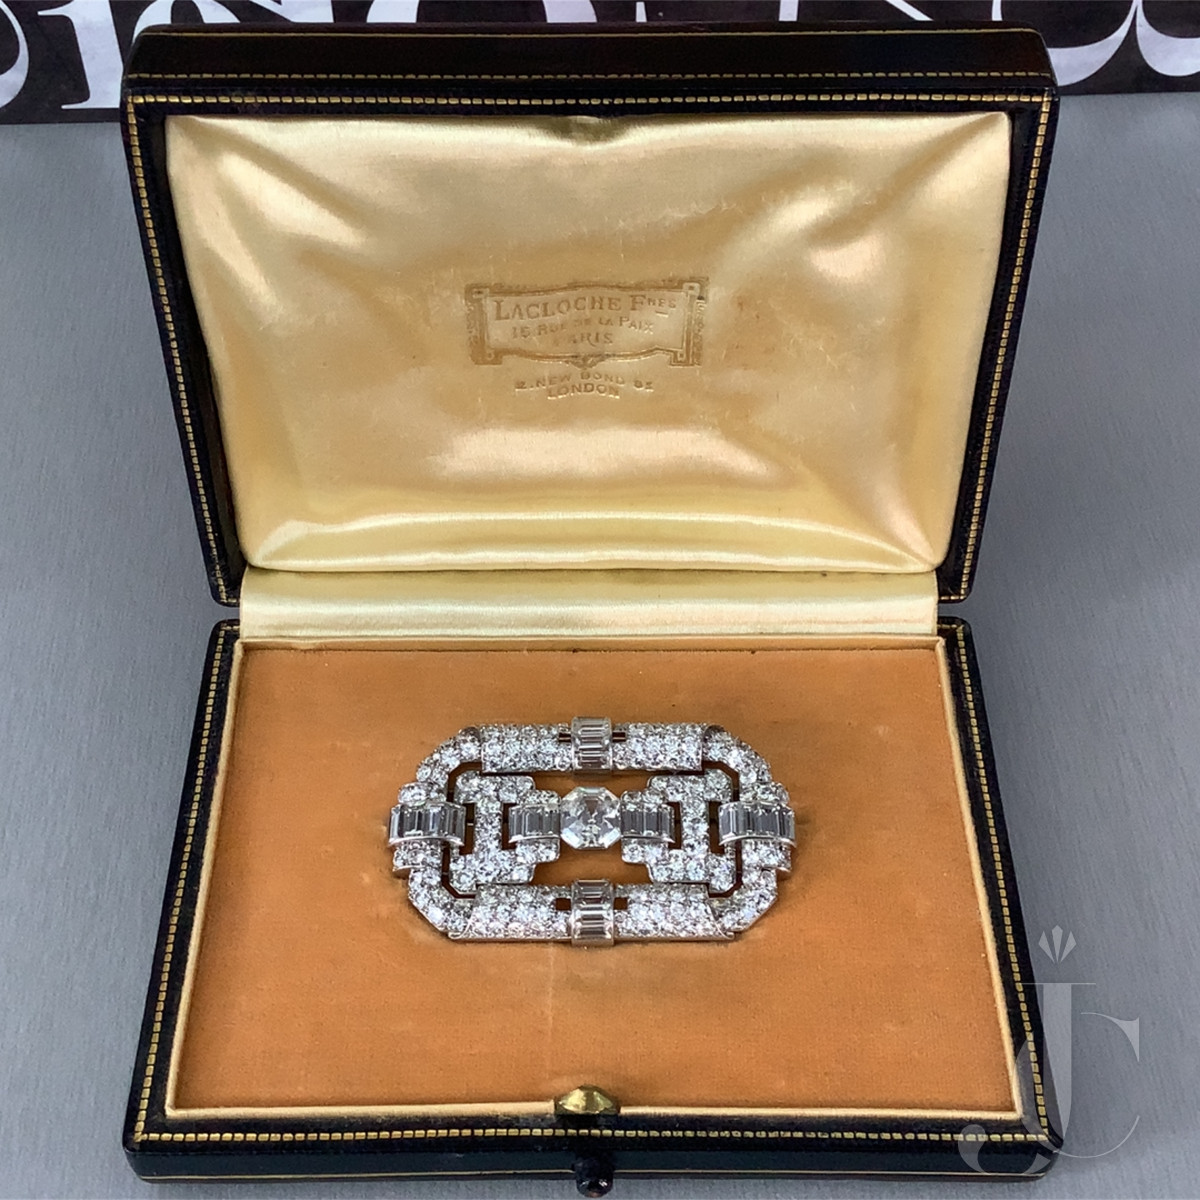 LaCloche Platinum and Diamond Brooch